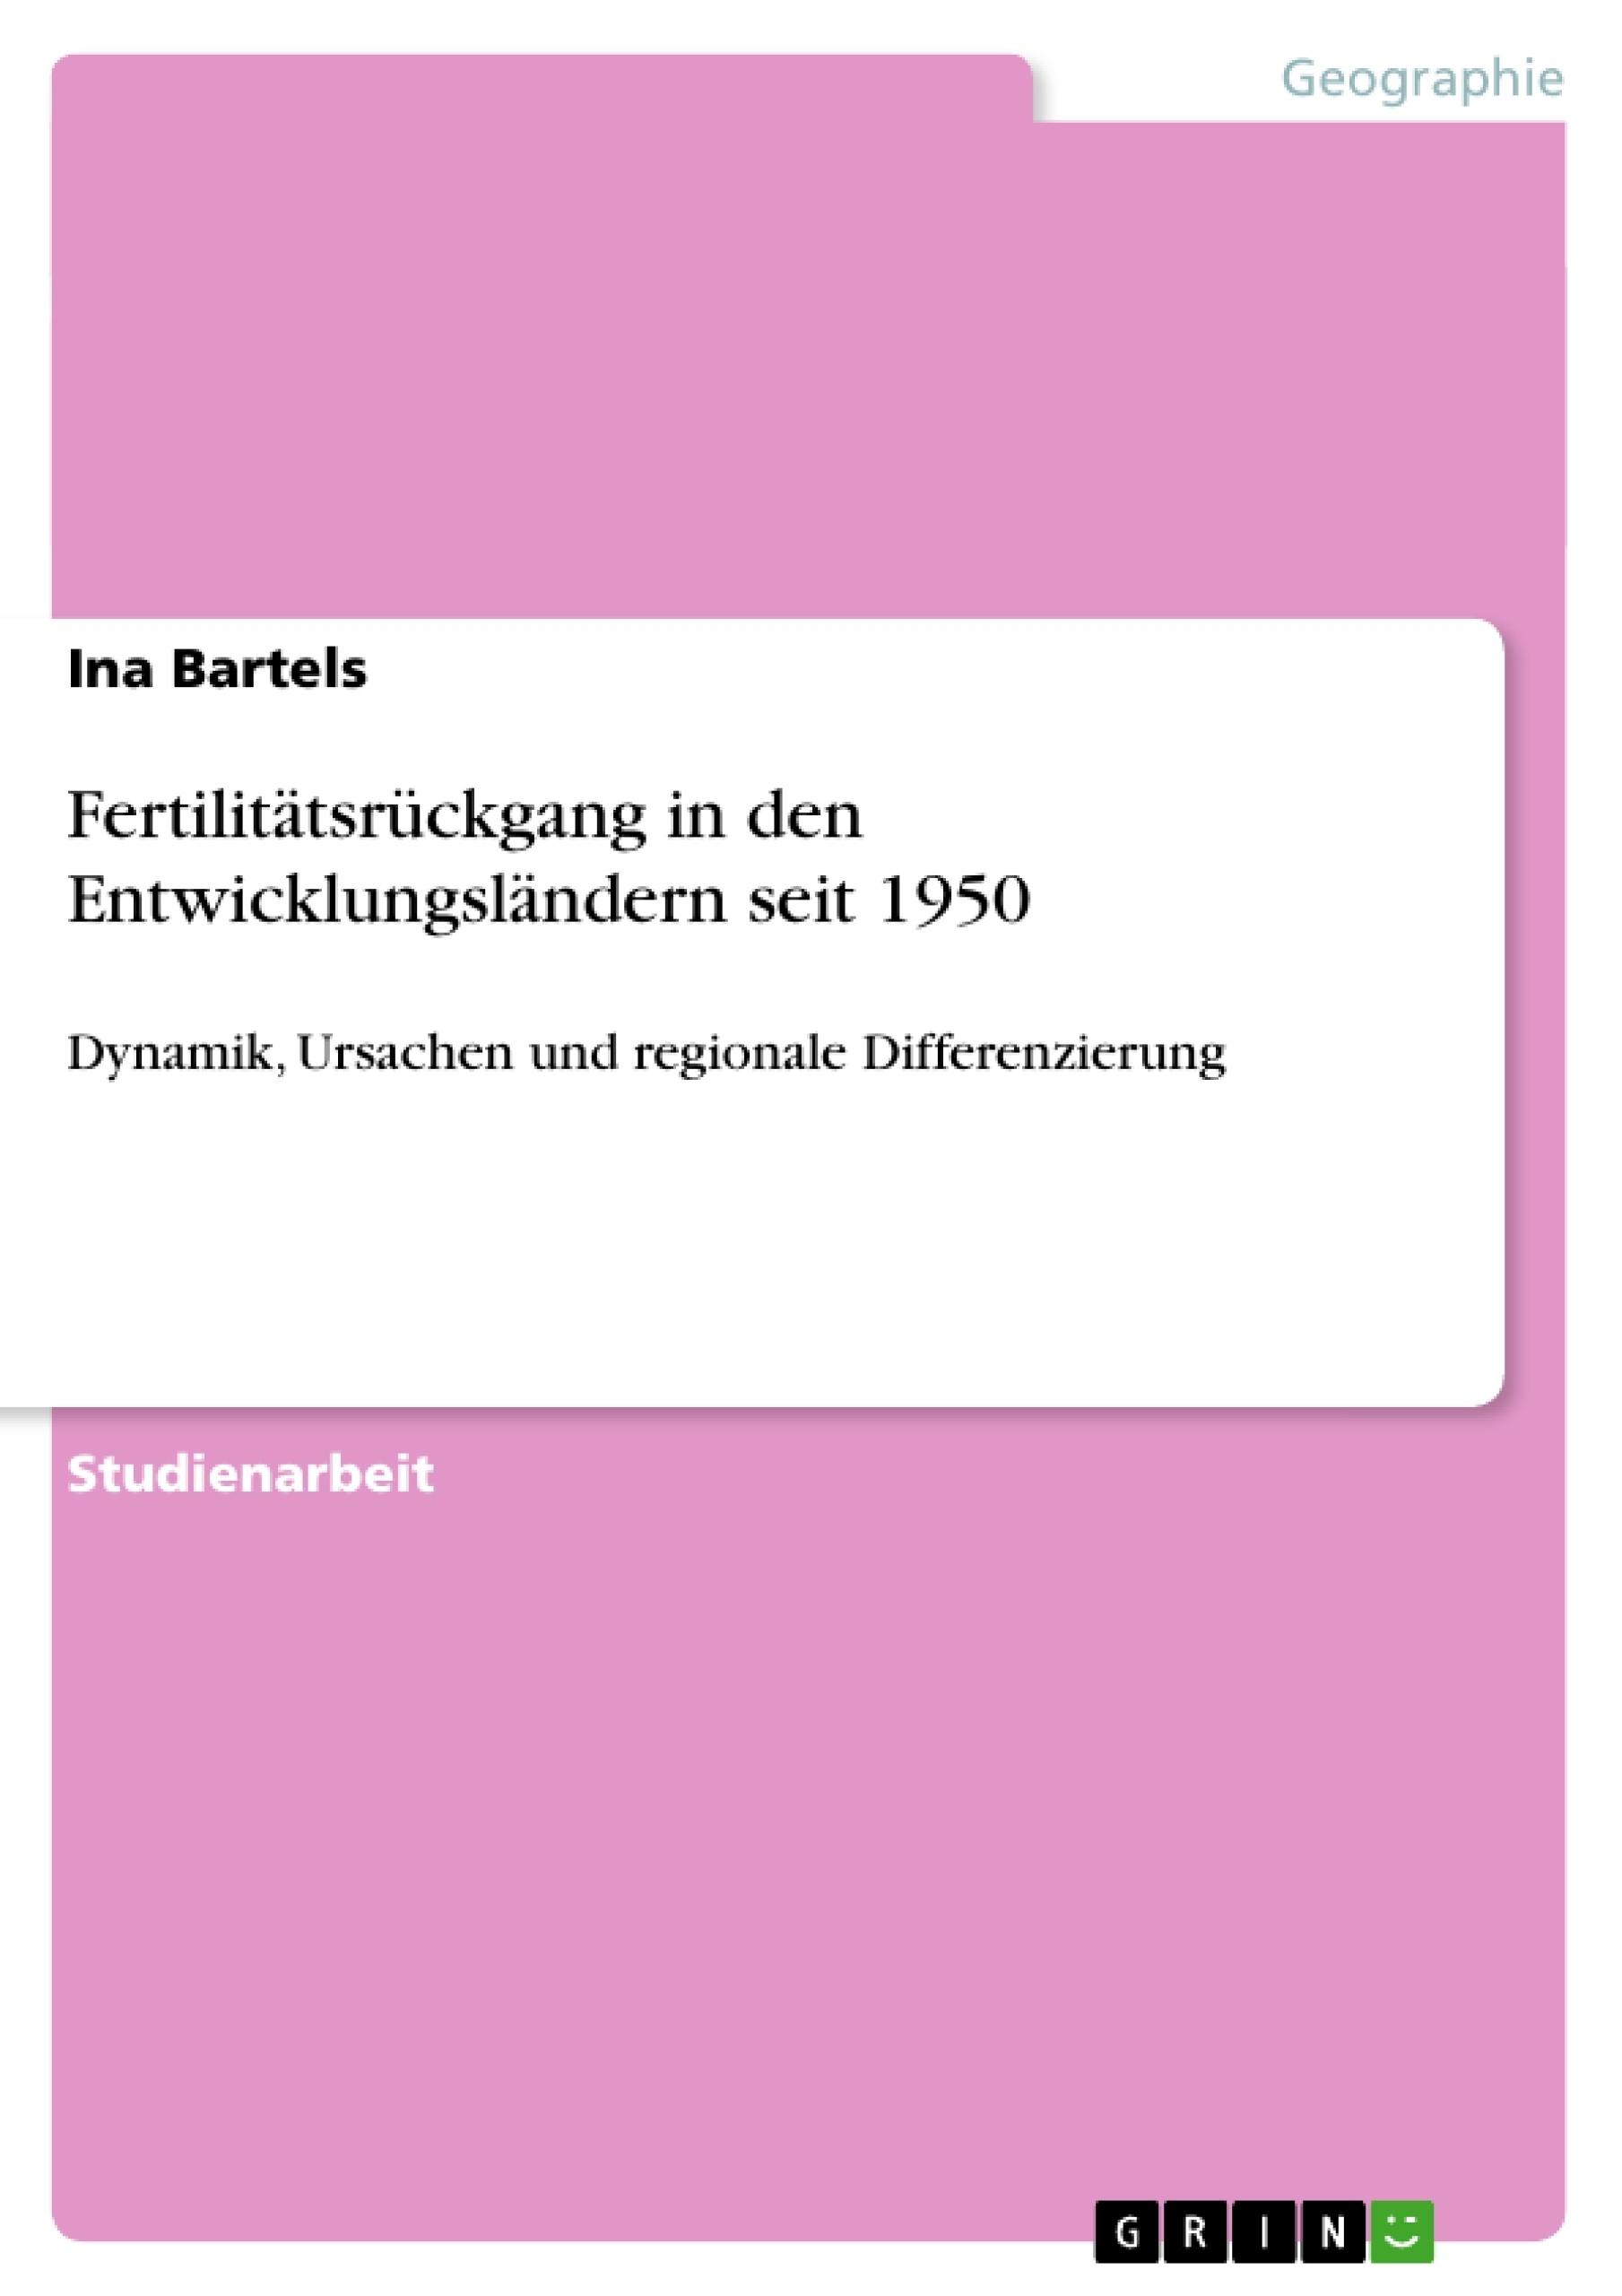 Titel: Fertilitätsrückgang in den Entwicklungsländern seit 1950